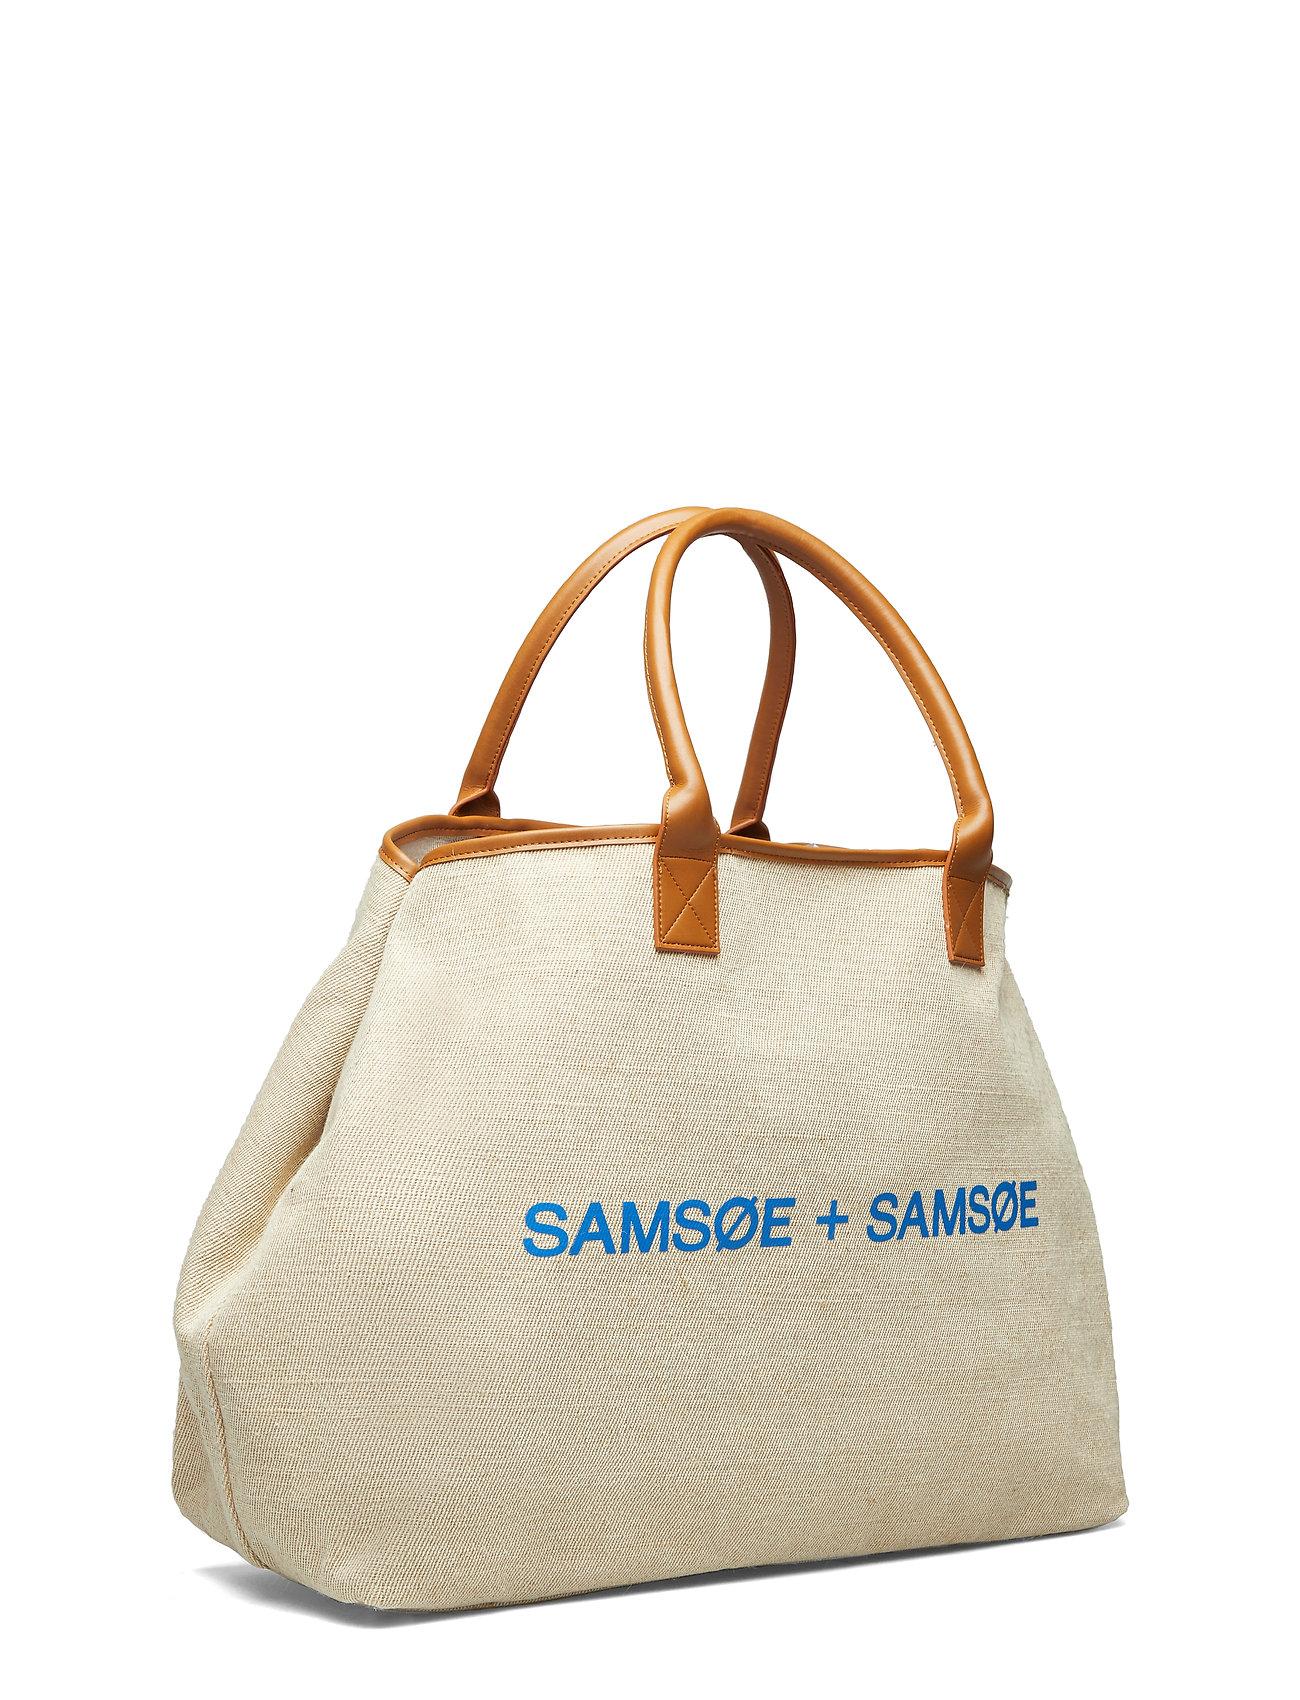 11166light Kellie Kellie Kellie Bag Bag Bag KhakiSamsøeamp; 11166light KhakiSamsøeamp; 11166light derCxBo